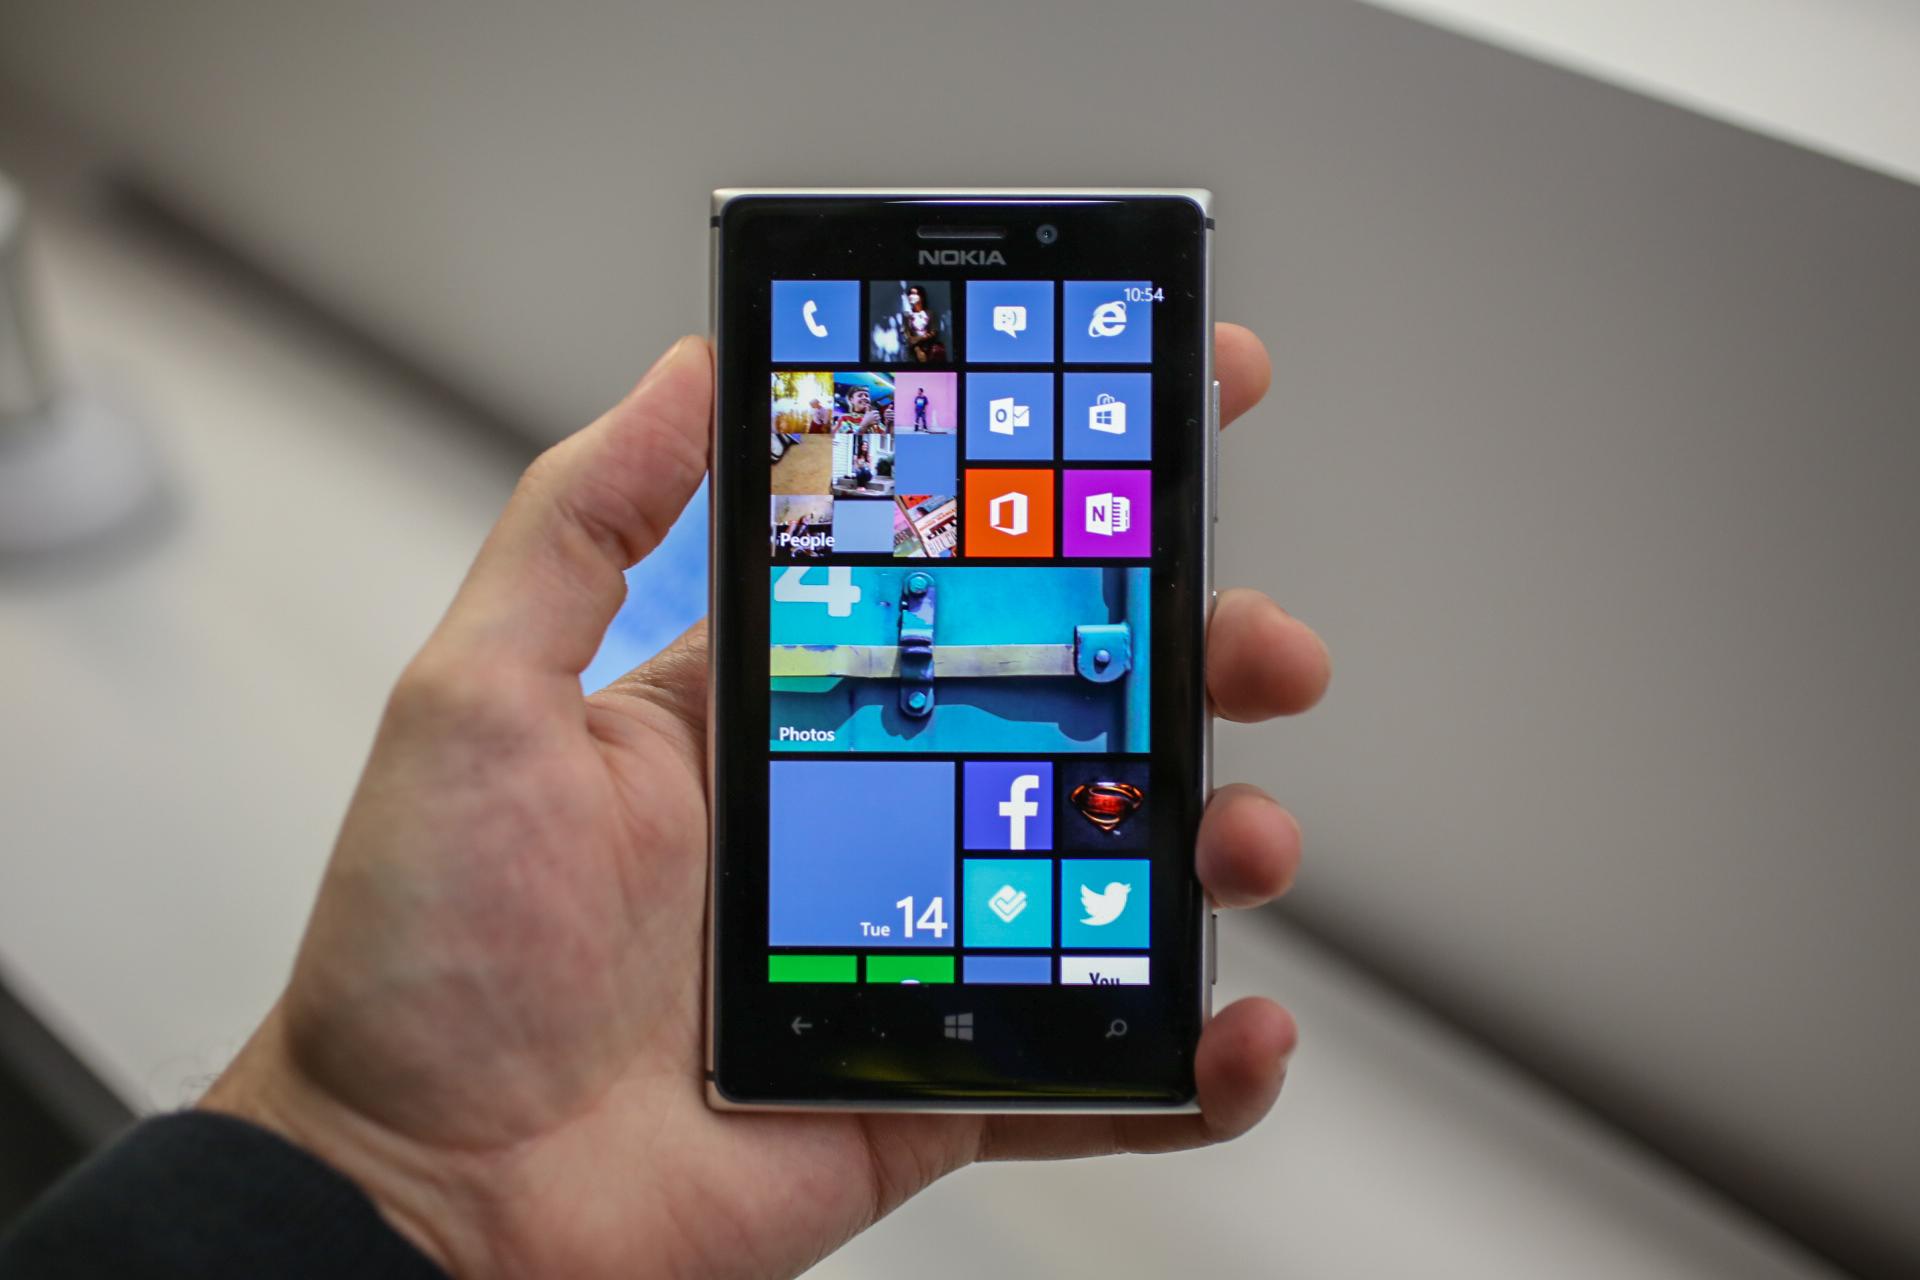 Promo Harga Nokia Lumia 925 Terbaru 2018 Police 14374js 02m Jam Tangan Pria Silver Wallpapers And Images Pictures Photos